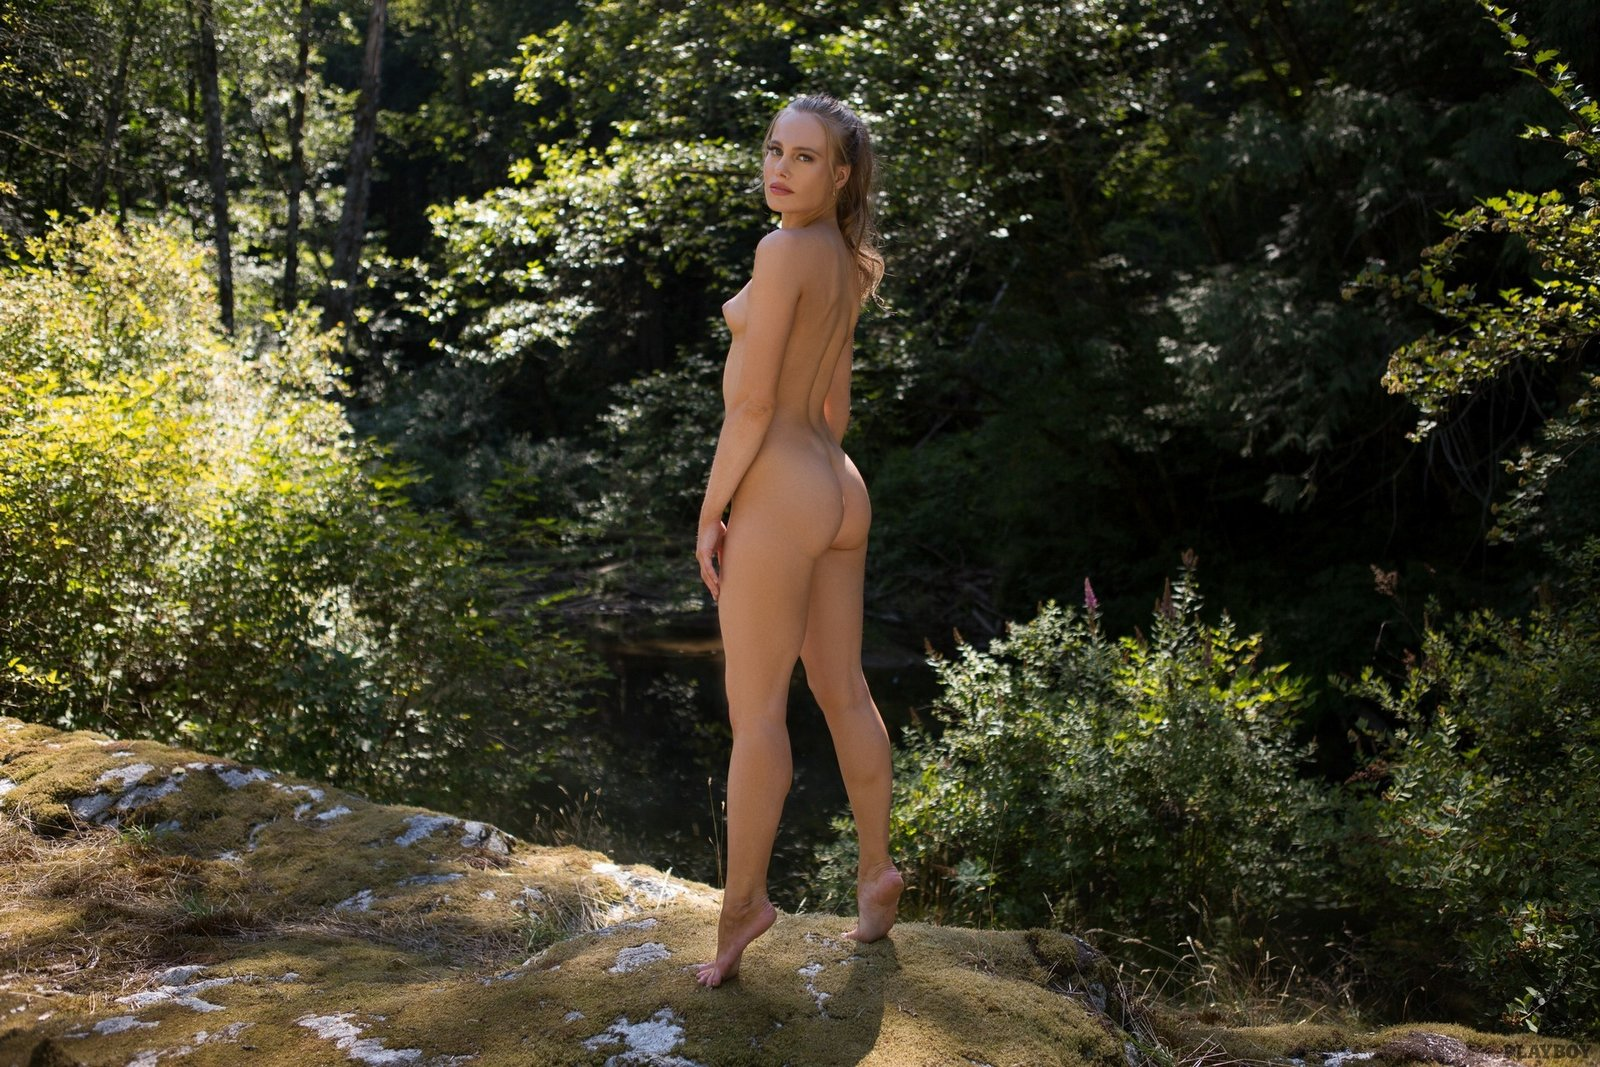 Gay nature porn